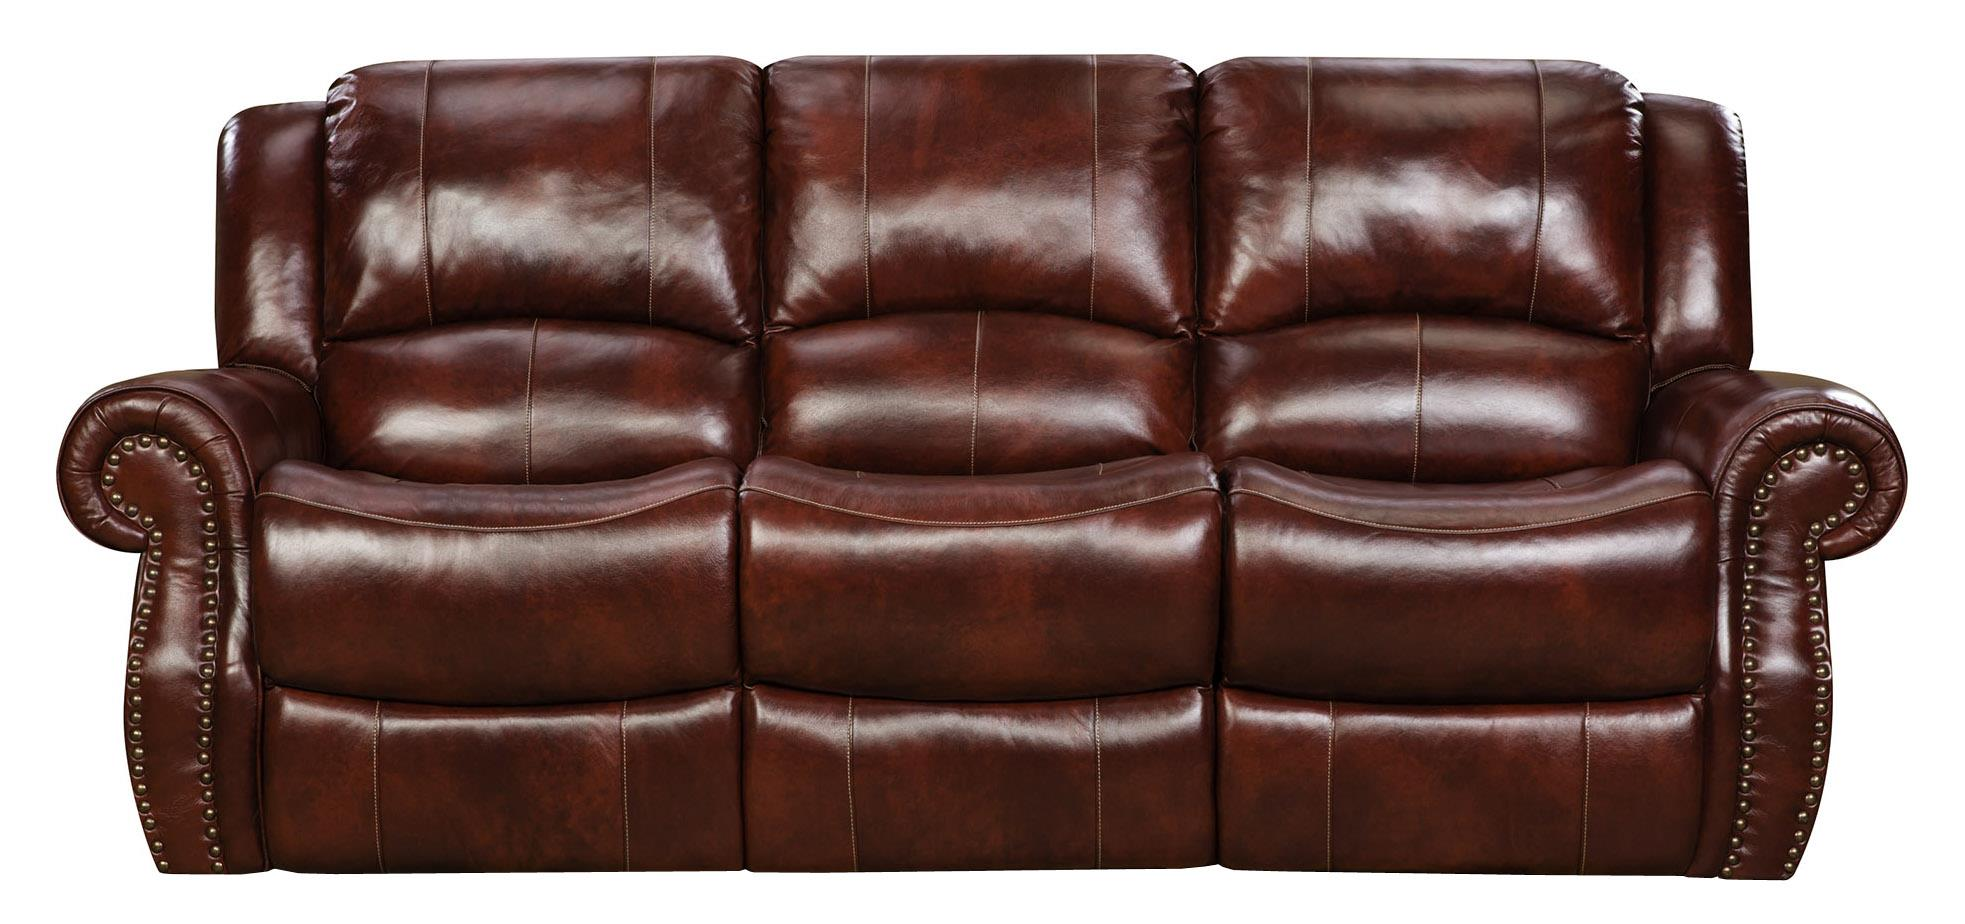 Corinthian 99901 Reclining Sofa - Item Number: 99901-30